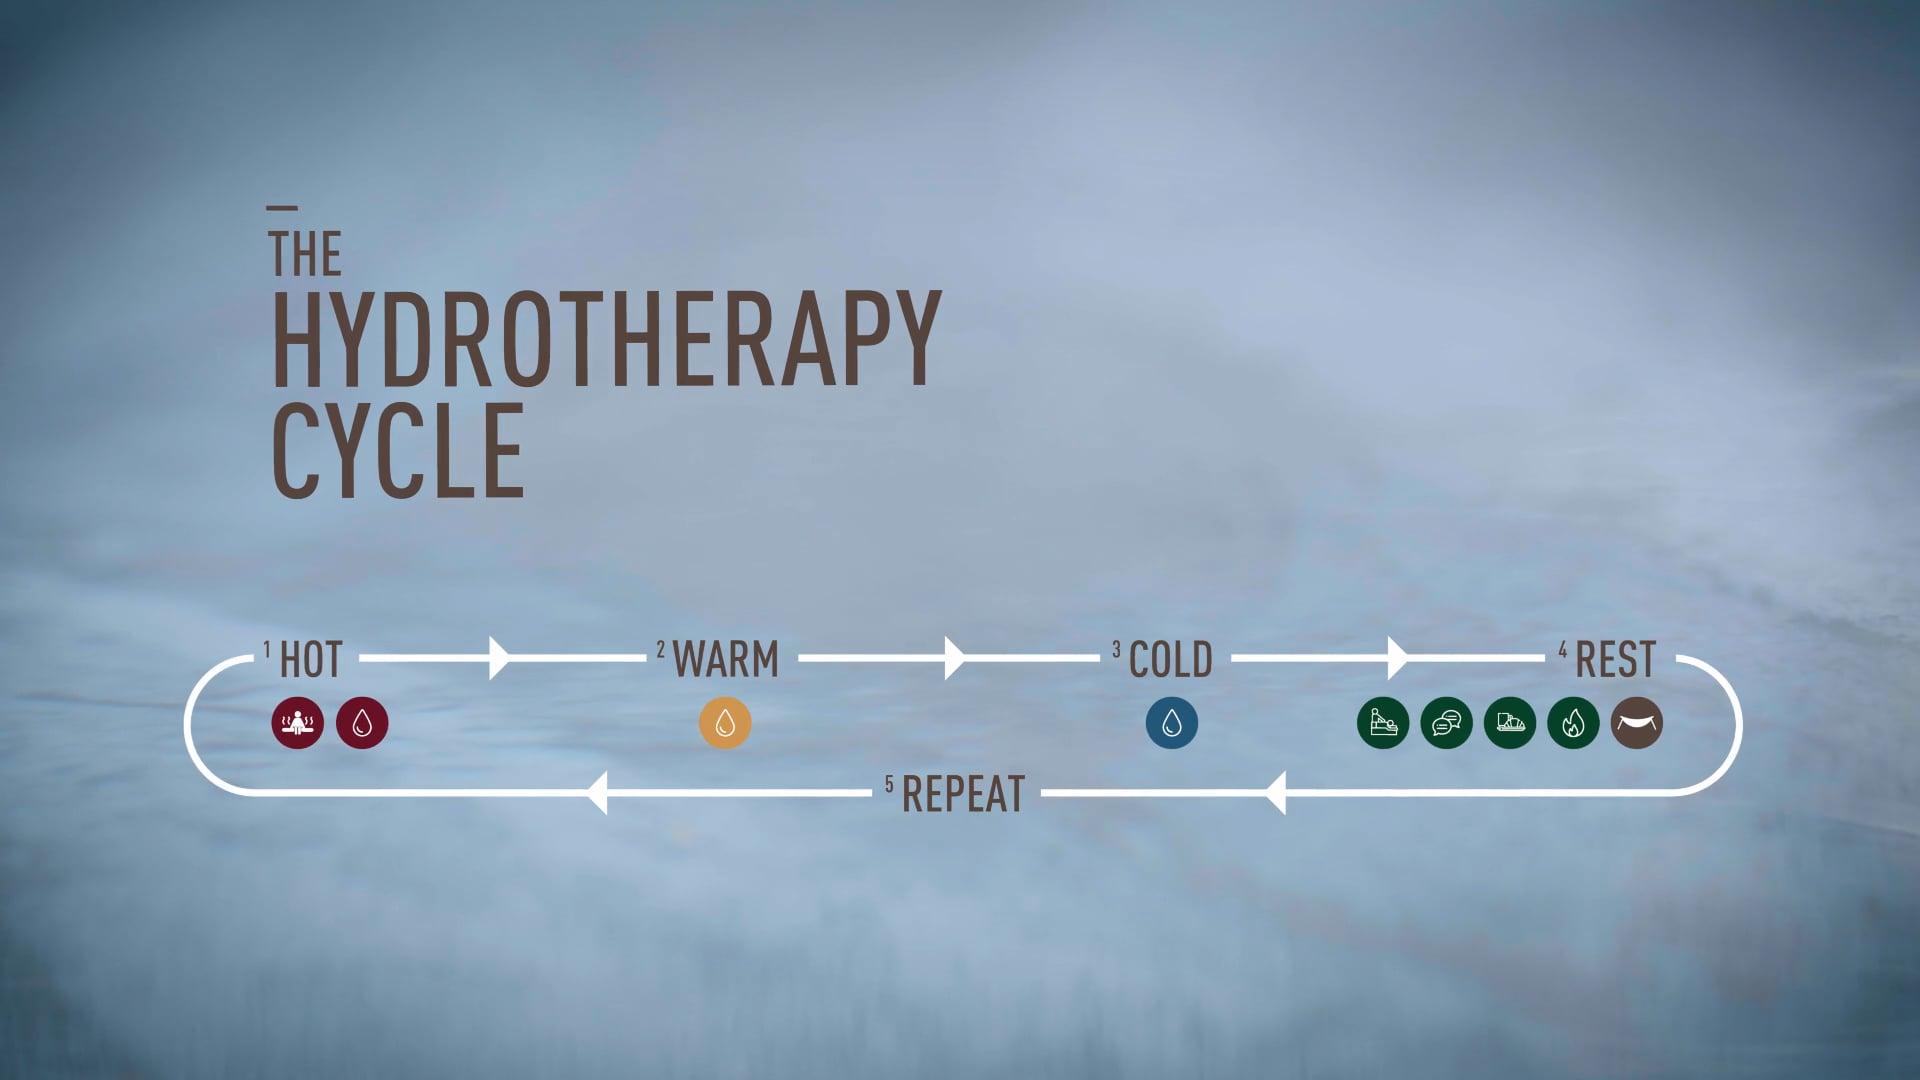 Kananaskis Nordic Spa - The Hydrotherapy Cycle